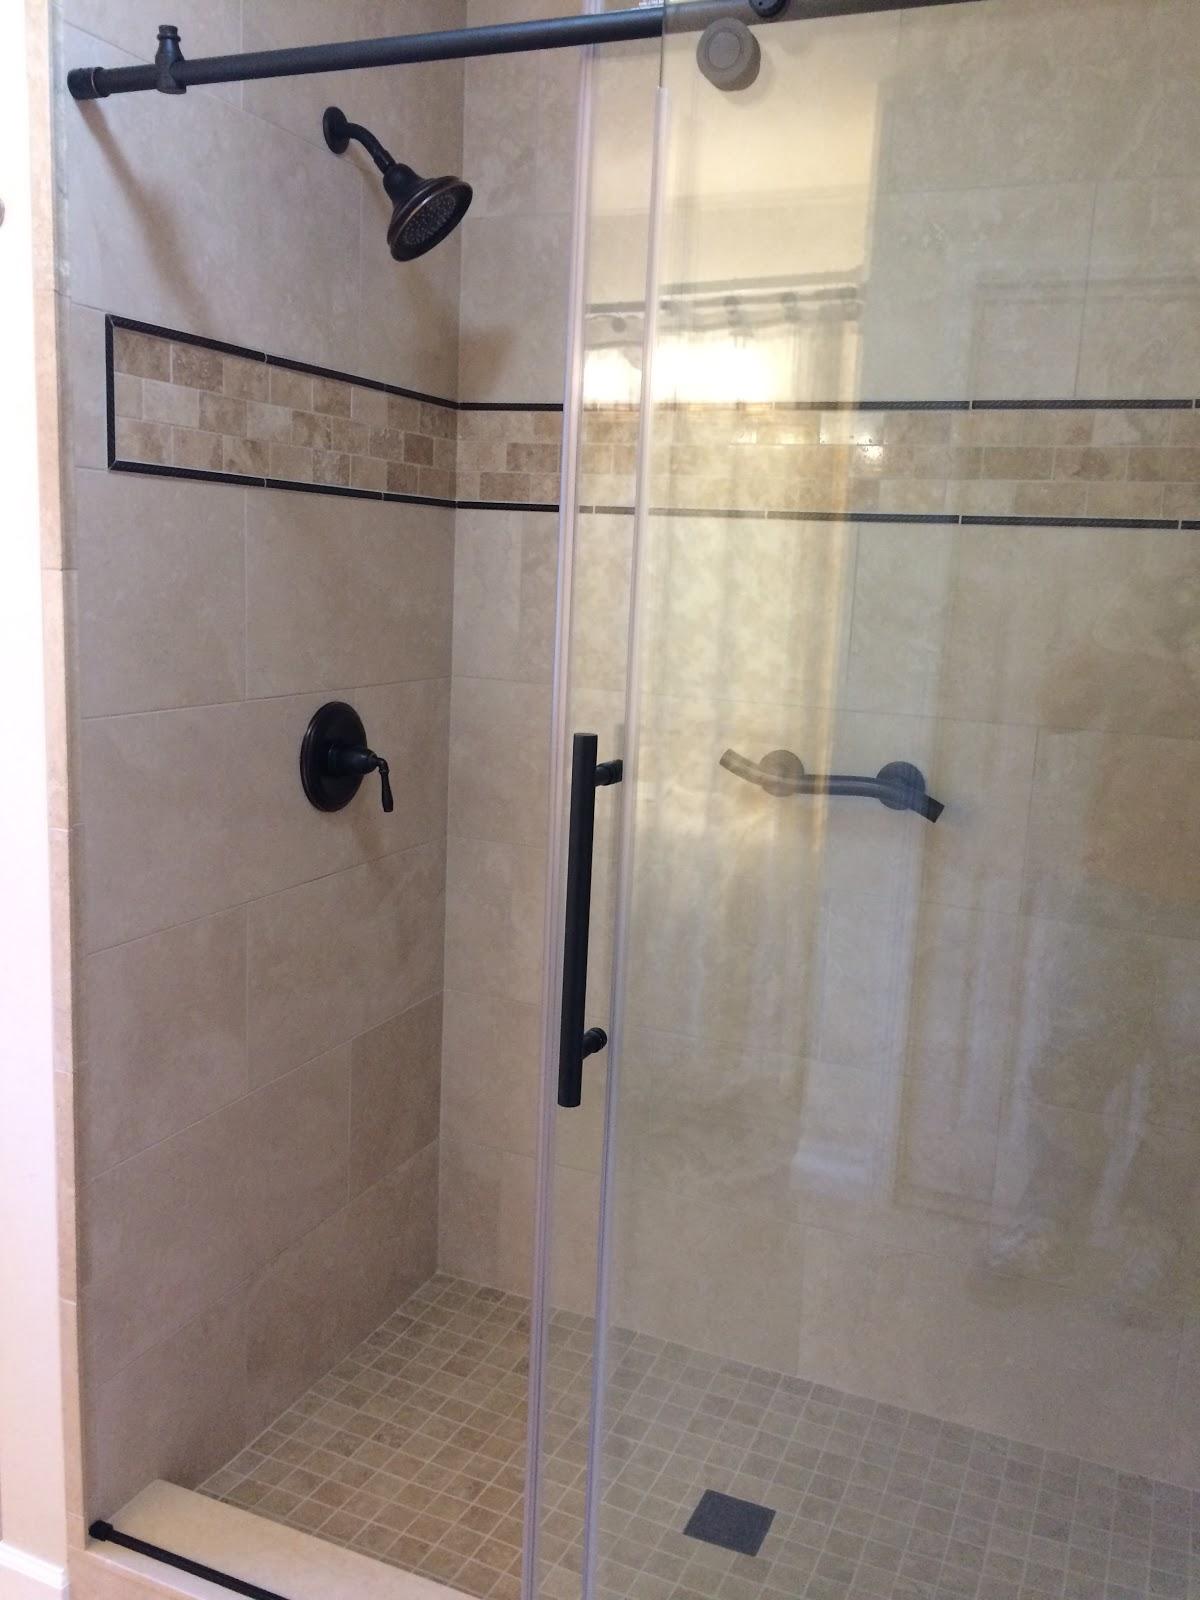 Custom Bathroom Remodeling Travertine Bathroom Remodel With Oil - Bathroom remodel danbury ct